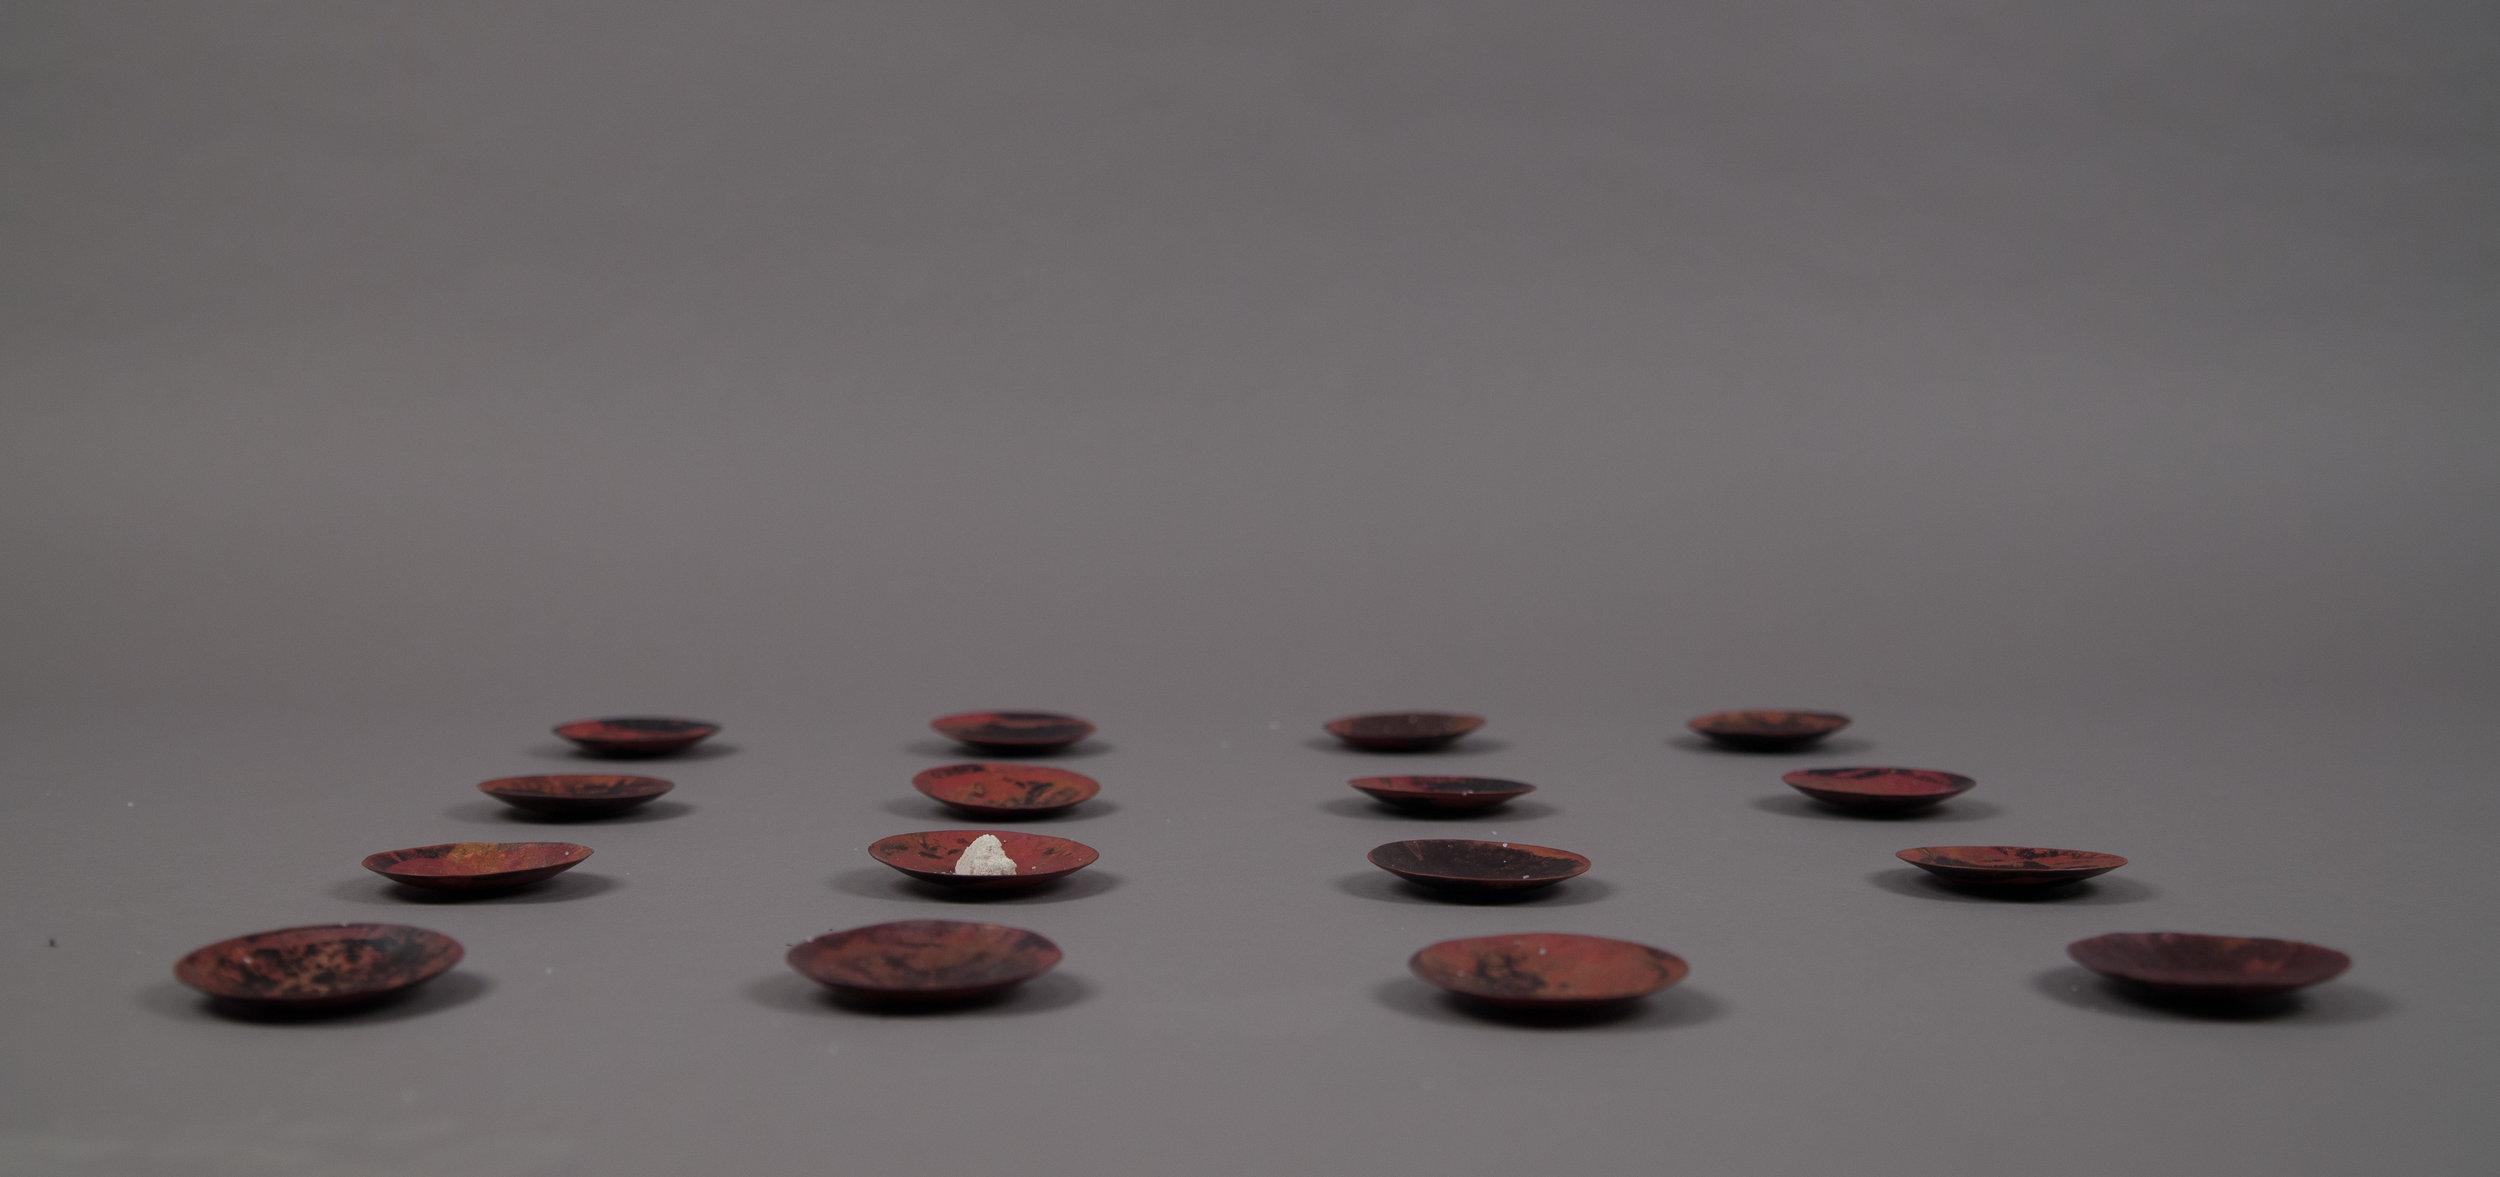 Sixteen Copper Bowls for Meditation